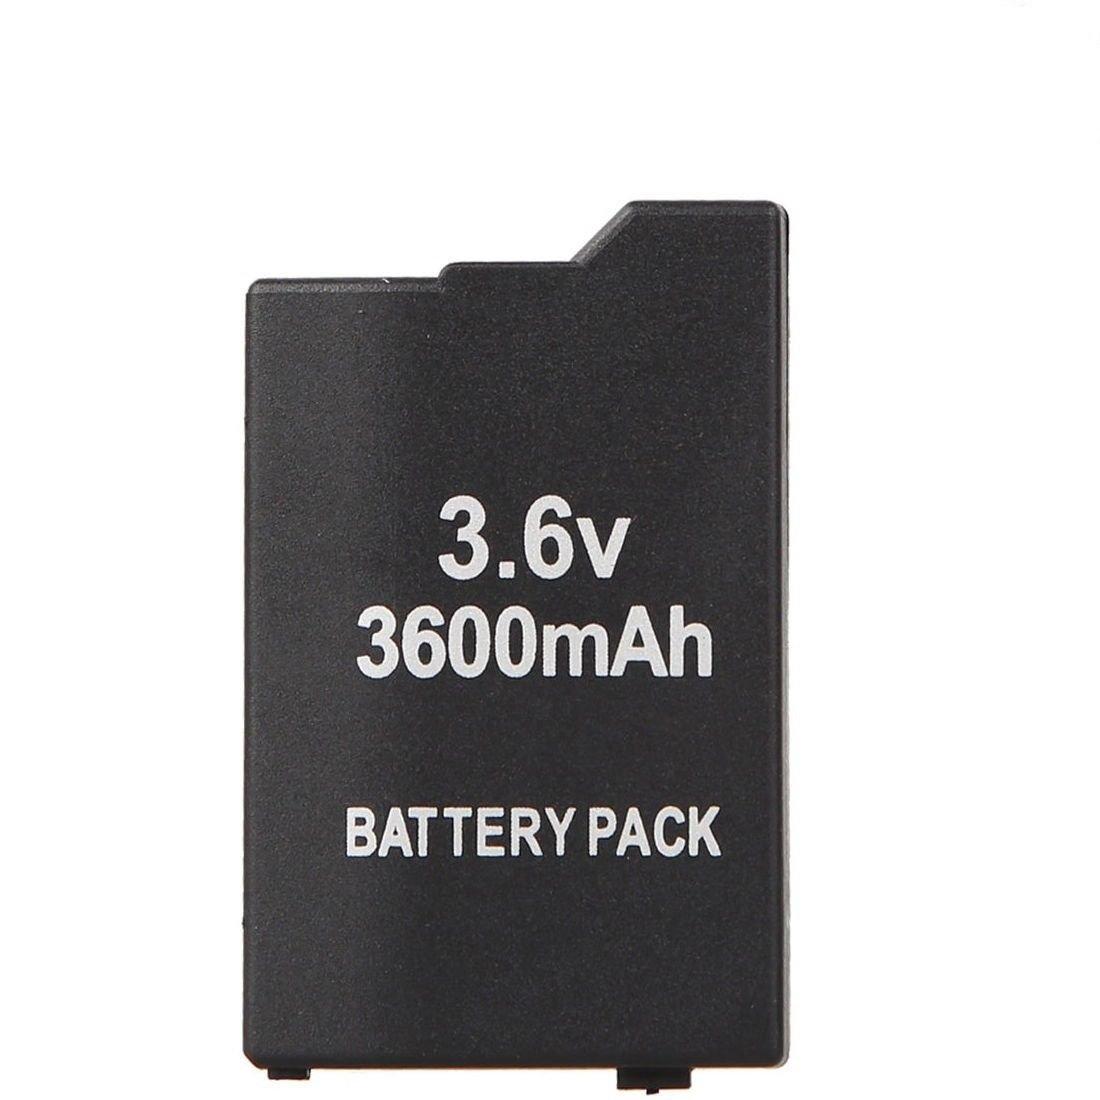 agf- batería PSP 1000 Fat 3.6 V 3600 mAh: Amazon.es: Electrónica